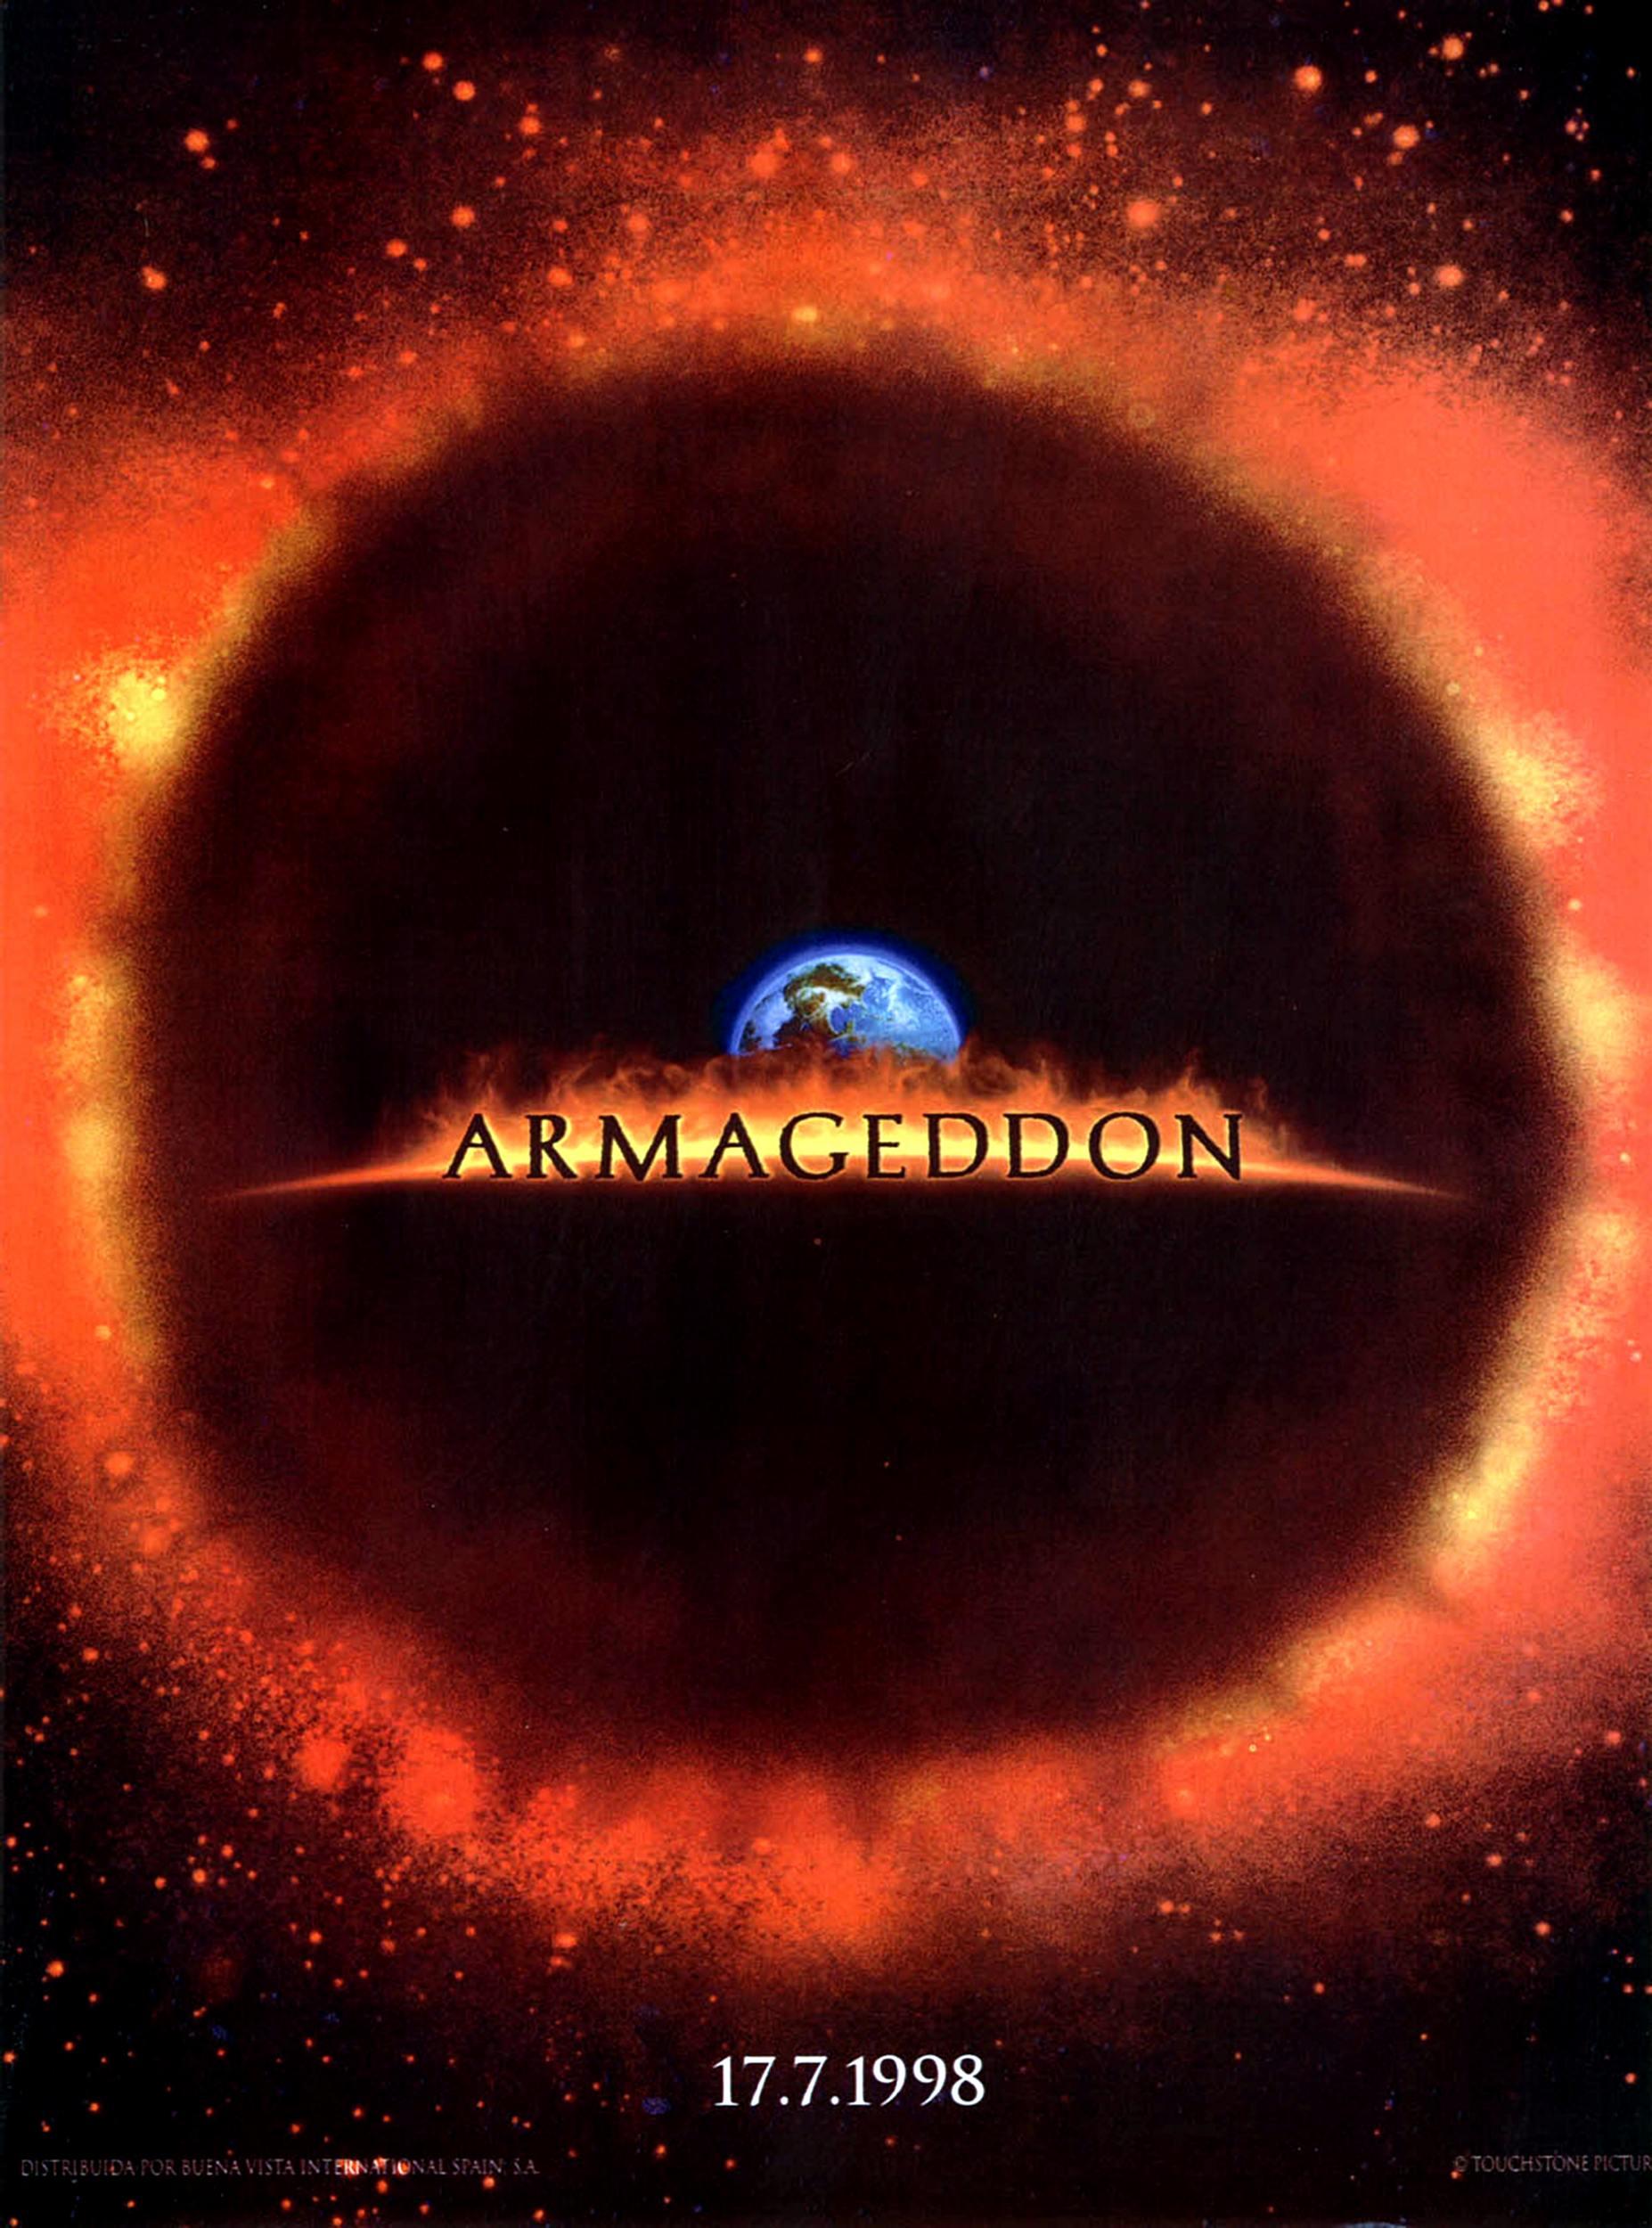 armageddon movie poster - HD1854×2500